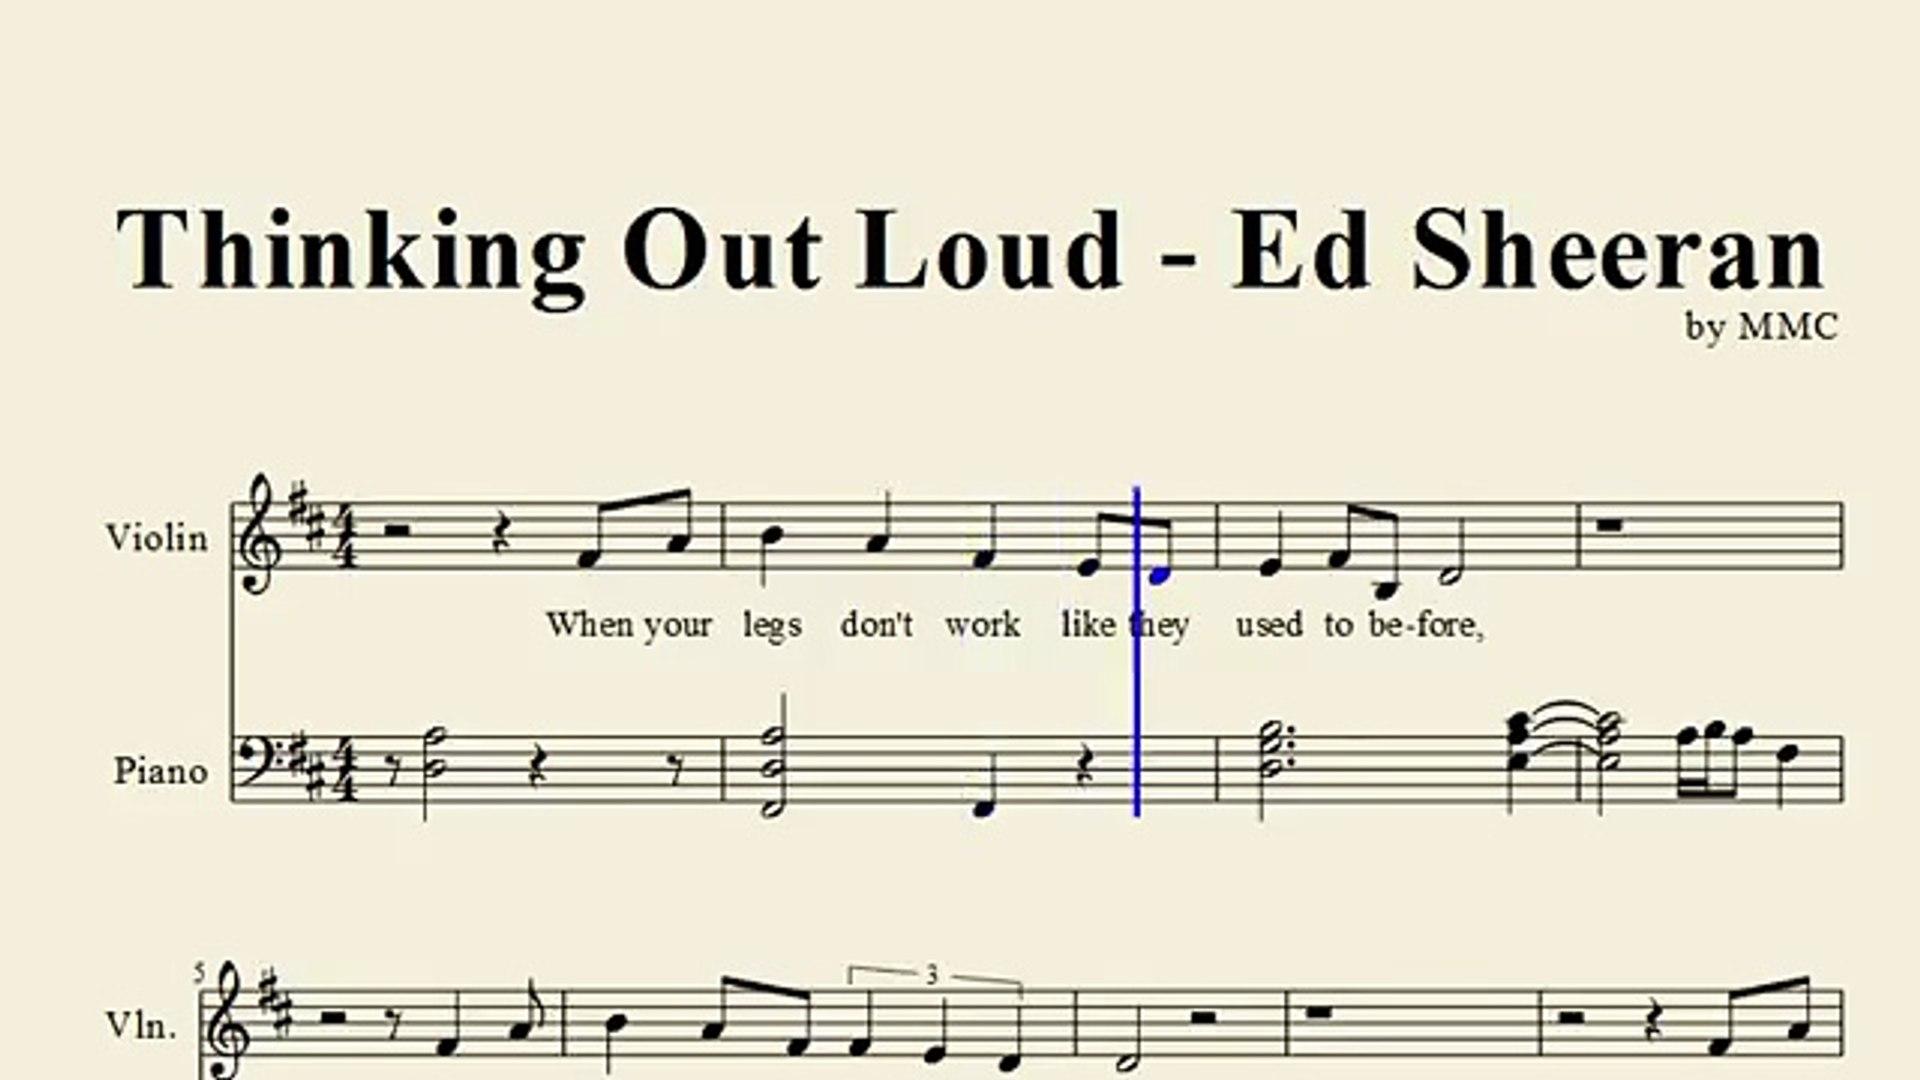 Thinking Out Loud Ed Sheeran Violin Sheet Music By Mmc